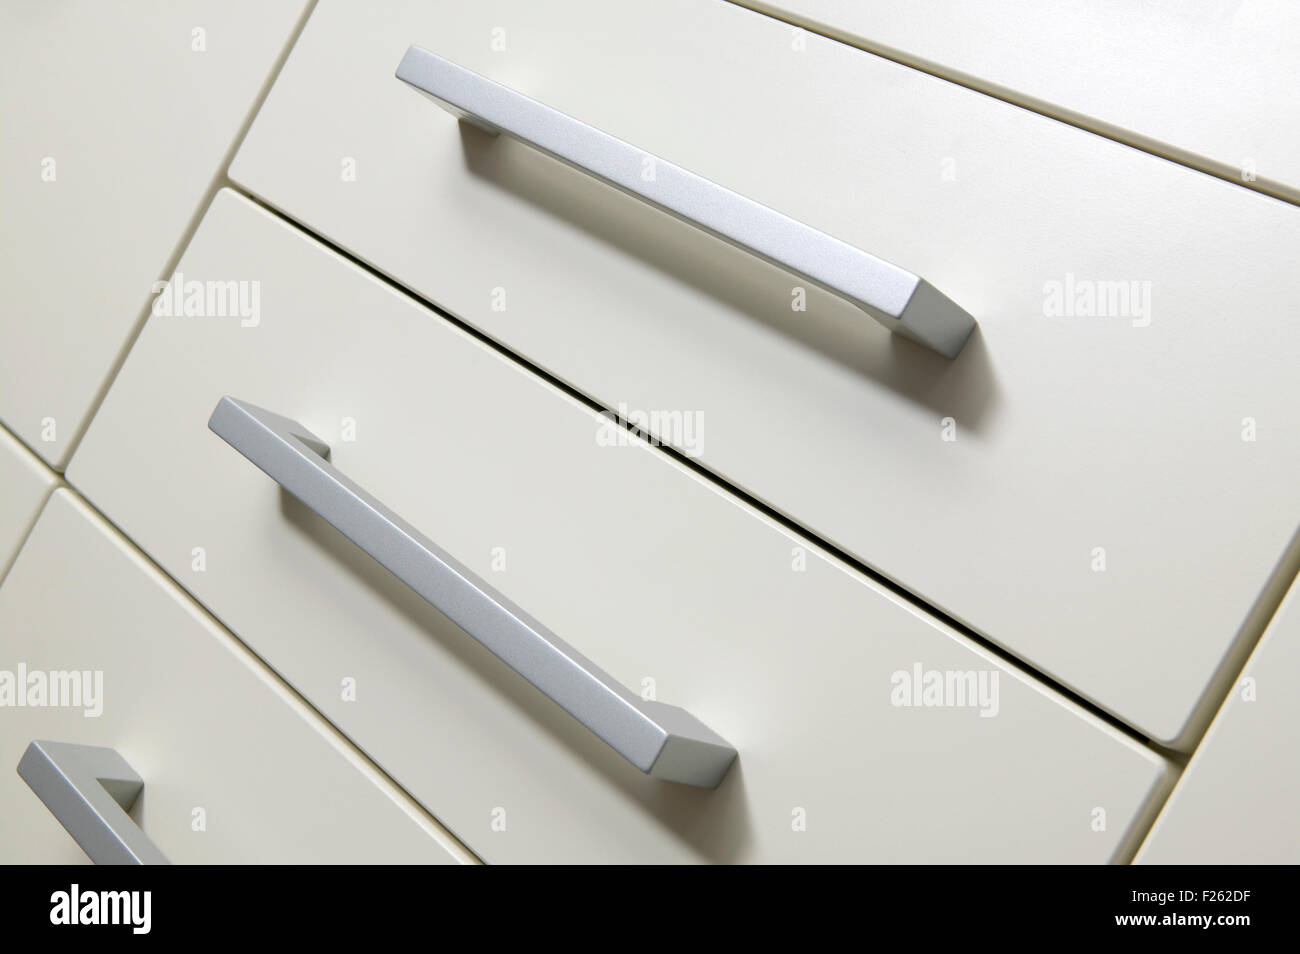 Knobs Flat Stockfotos & Knobs Flat Bilder - Alamy